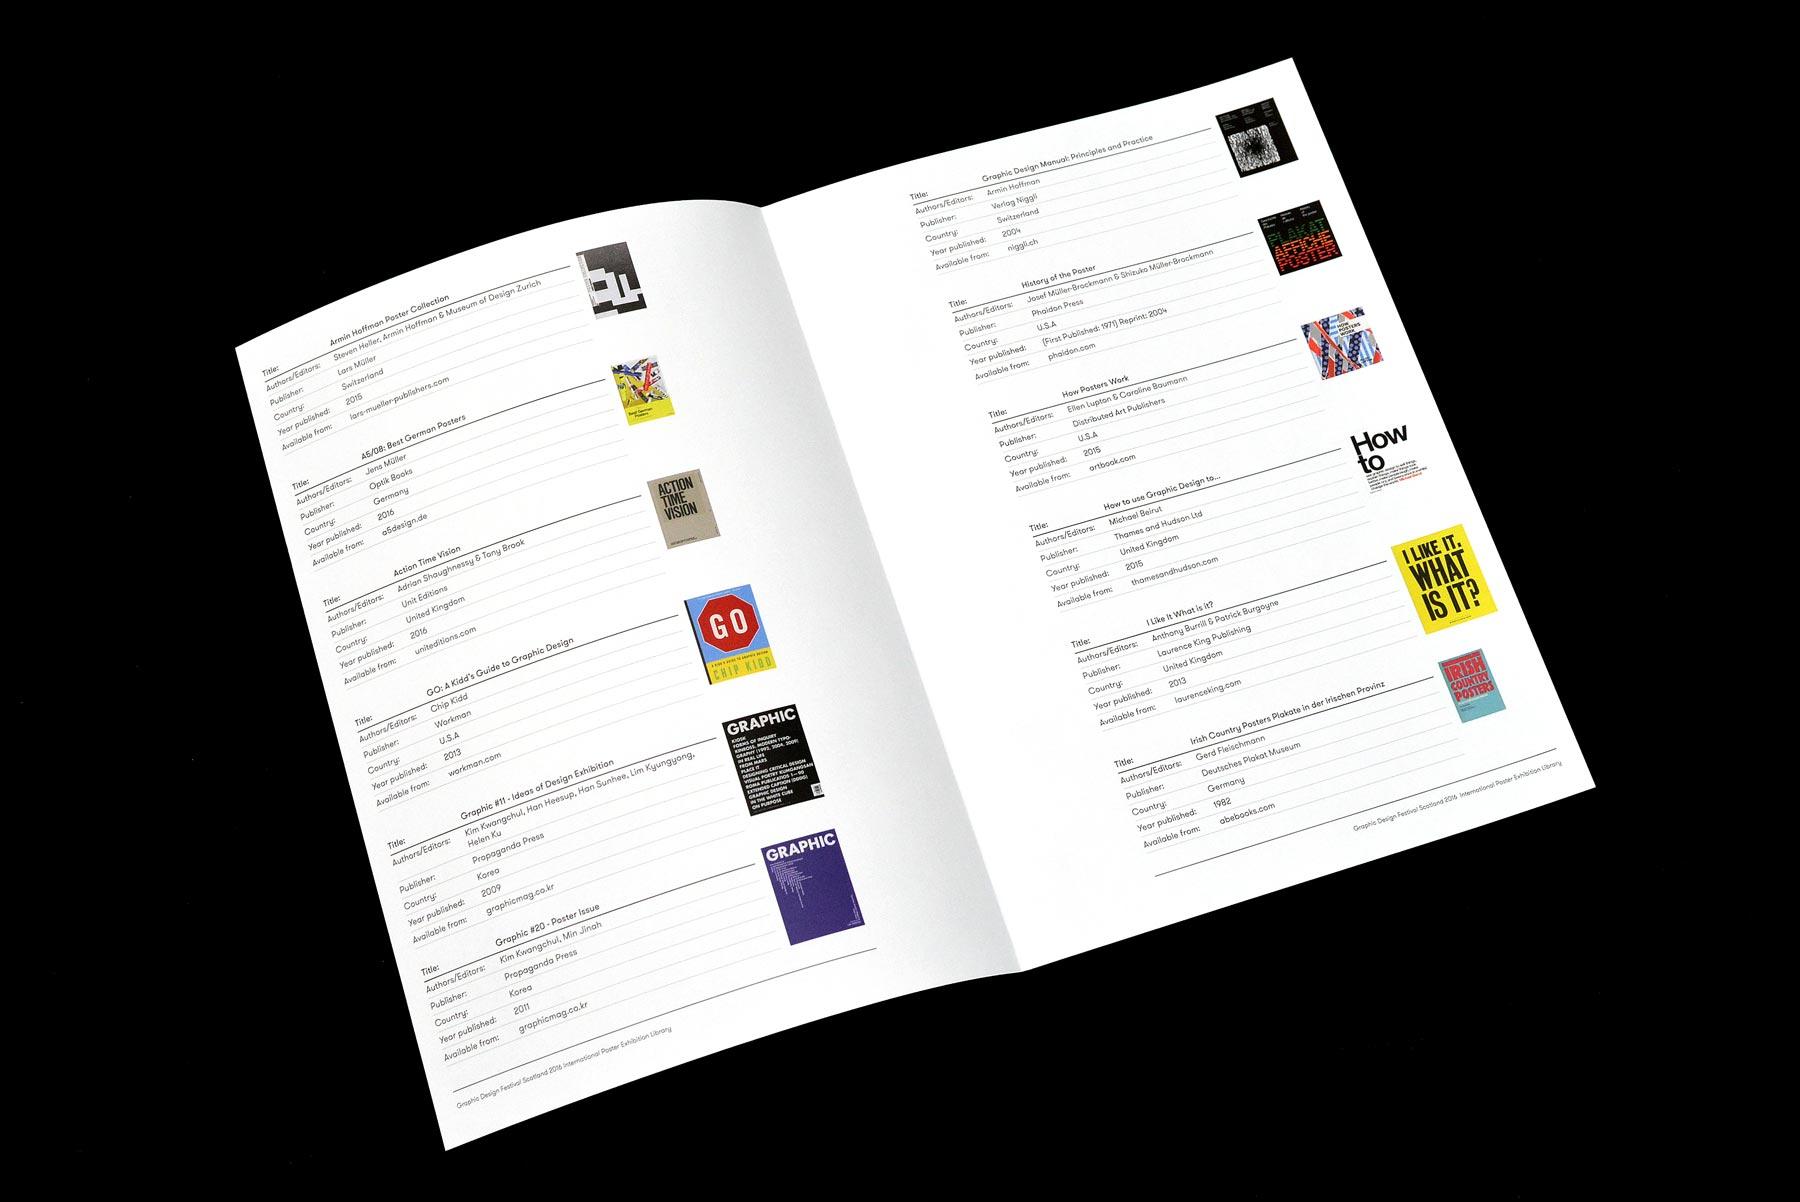 graphic-design-festival-scotland-2016-reading-list1